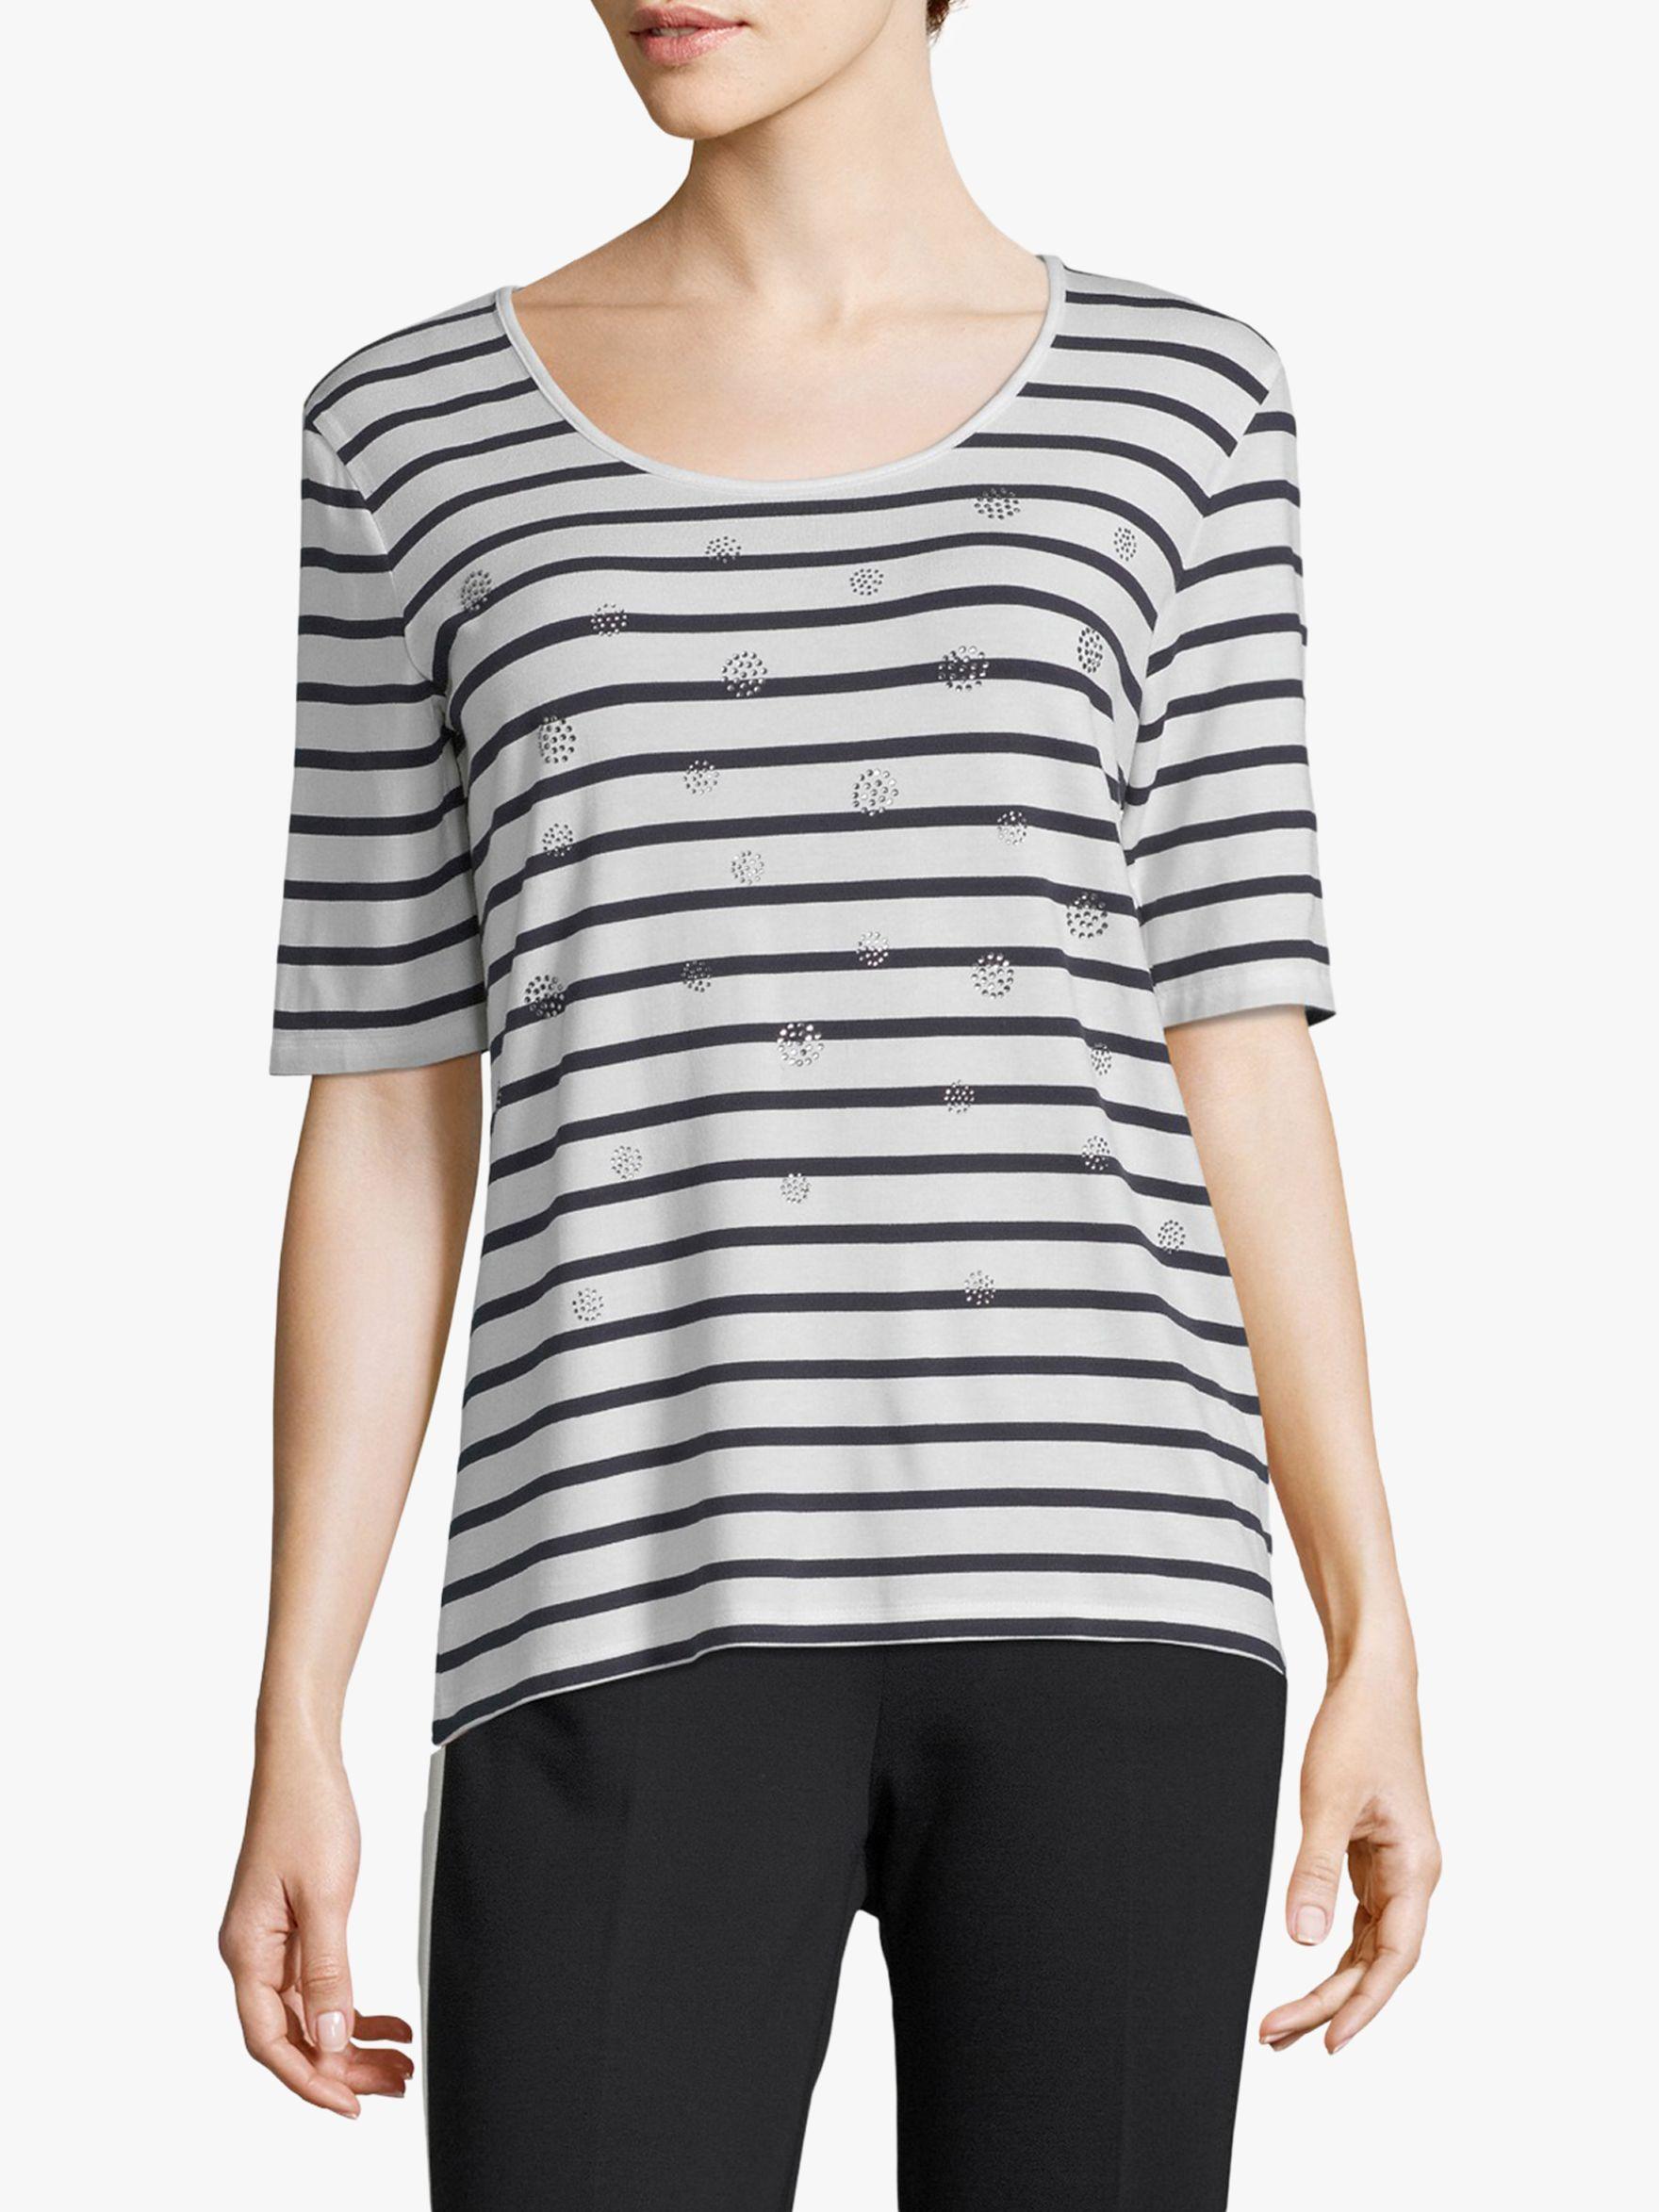 Betty Barclay Betty Barclay Striped T-Shirt, Cream/Dark Blue